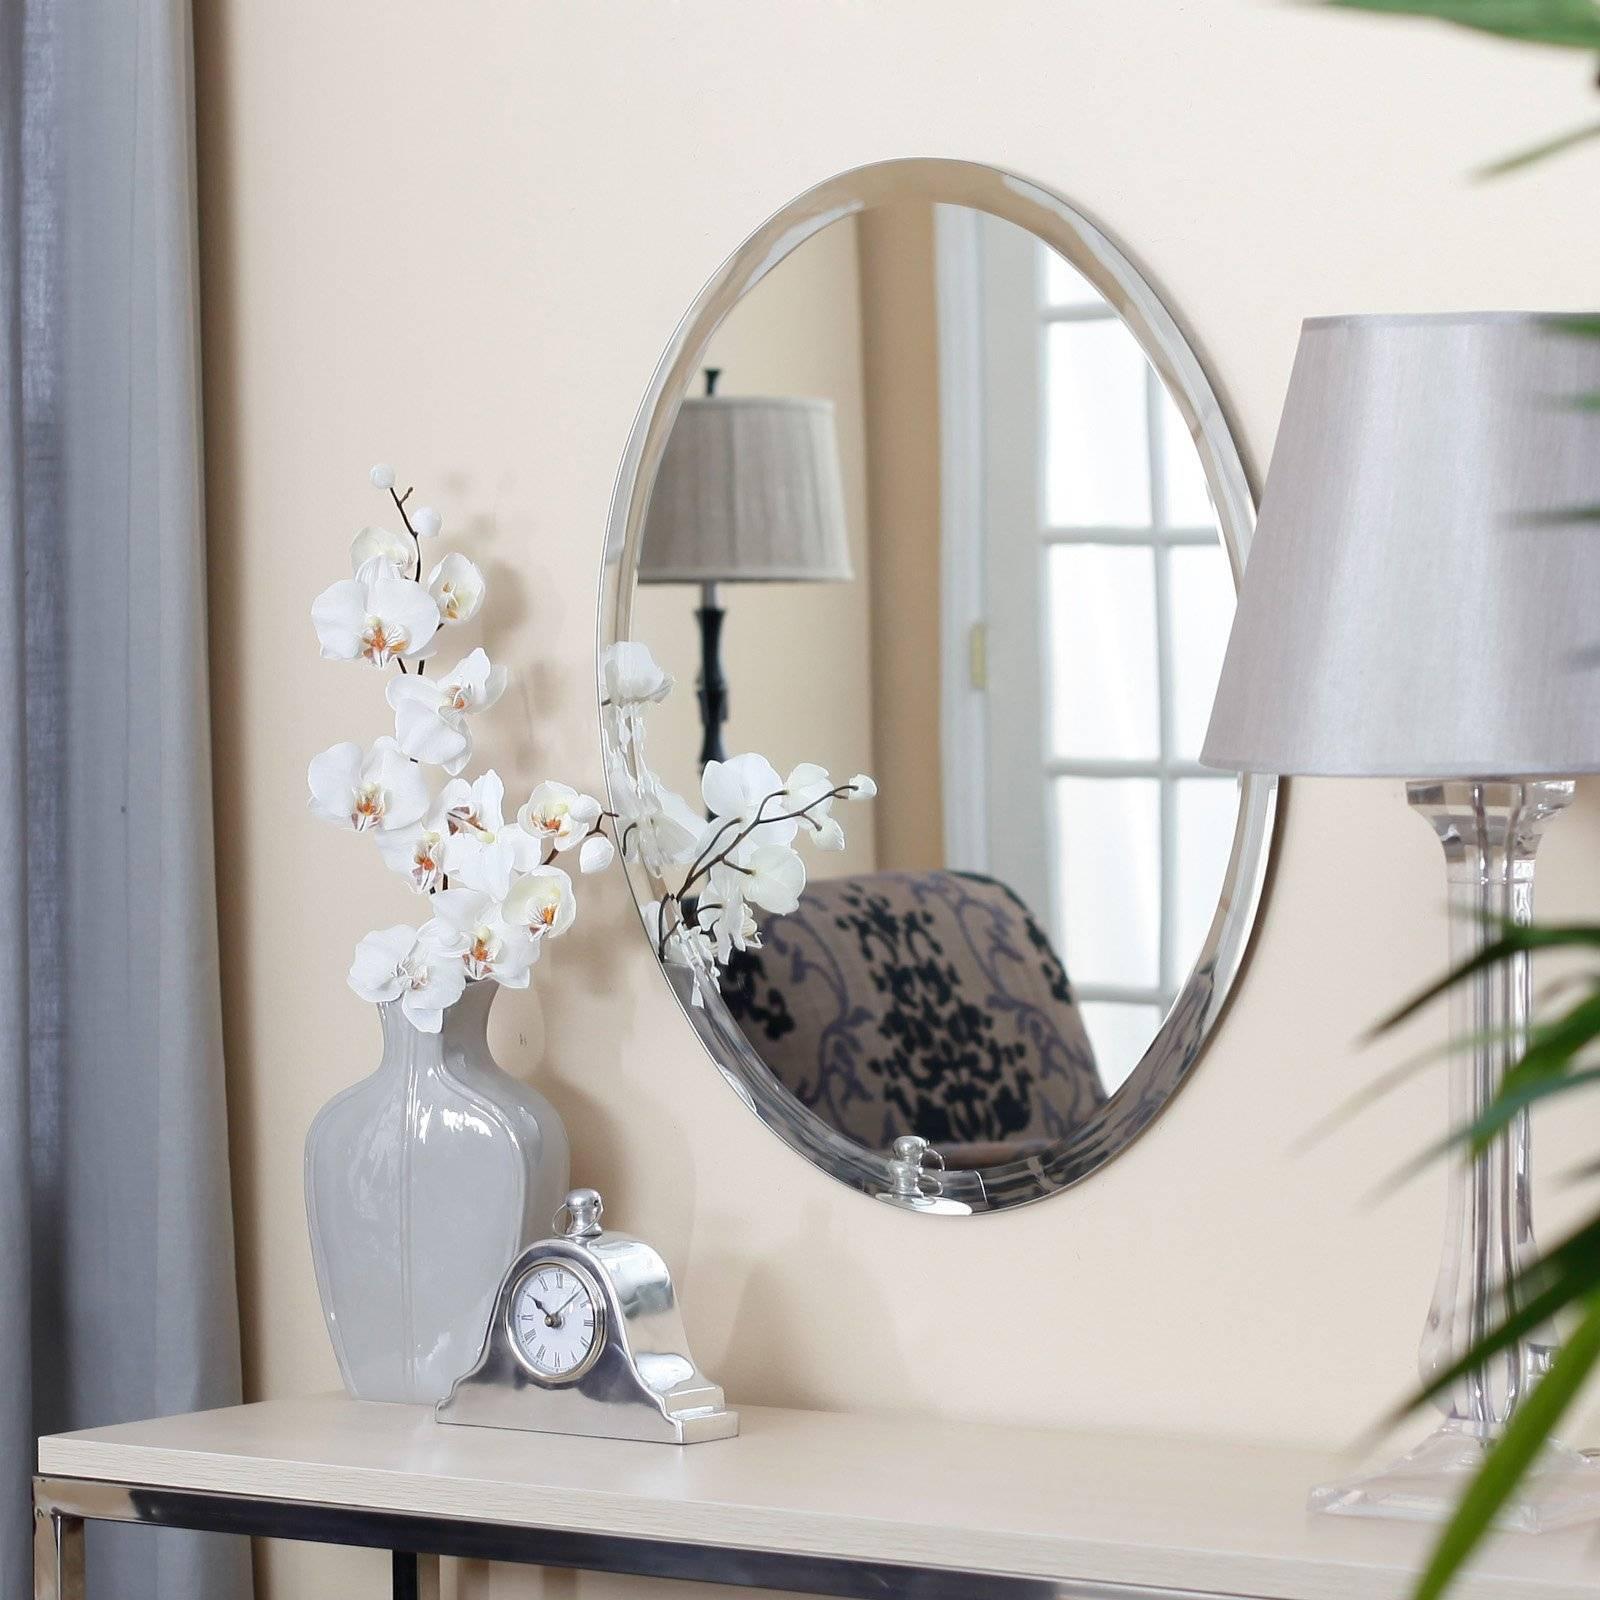 Uttermost Frameless Oval Beveled Vanity Mirror | Hayneedle regarding Beveled Edge Oval Mirrors (Image 25 of 25)